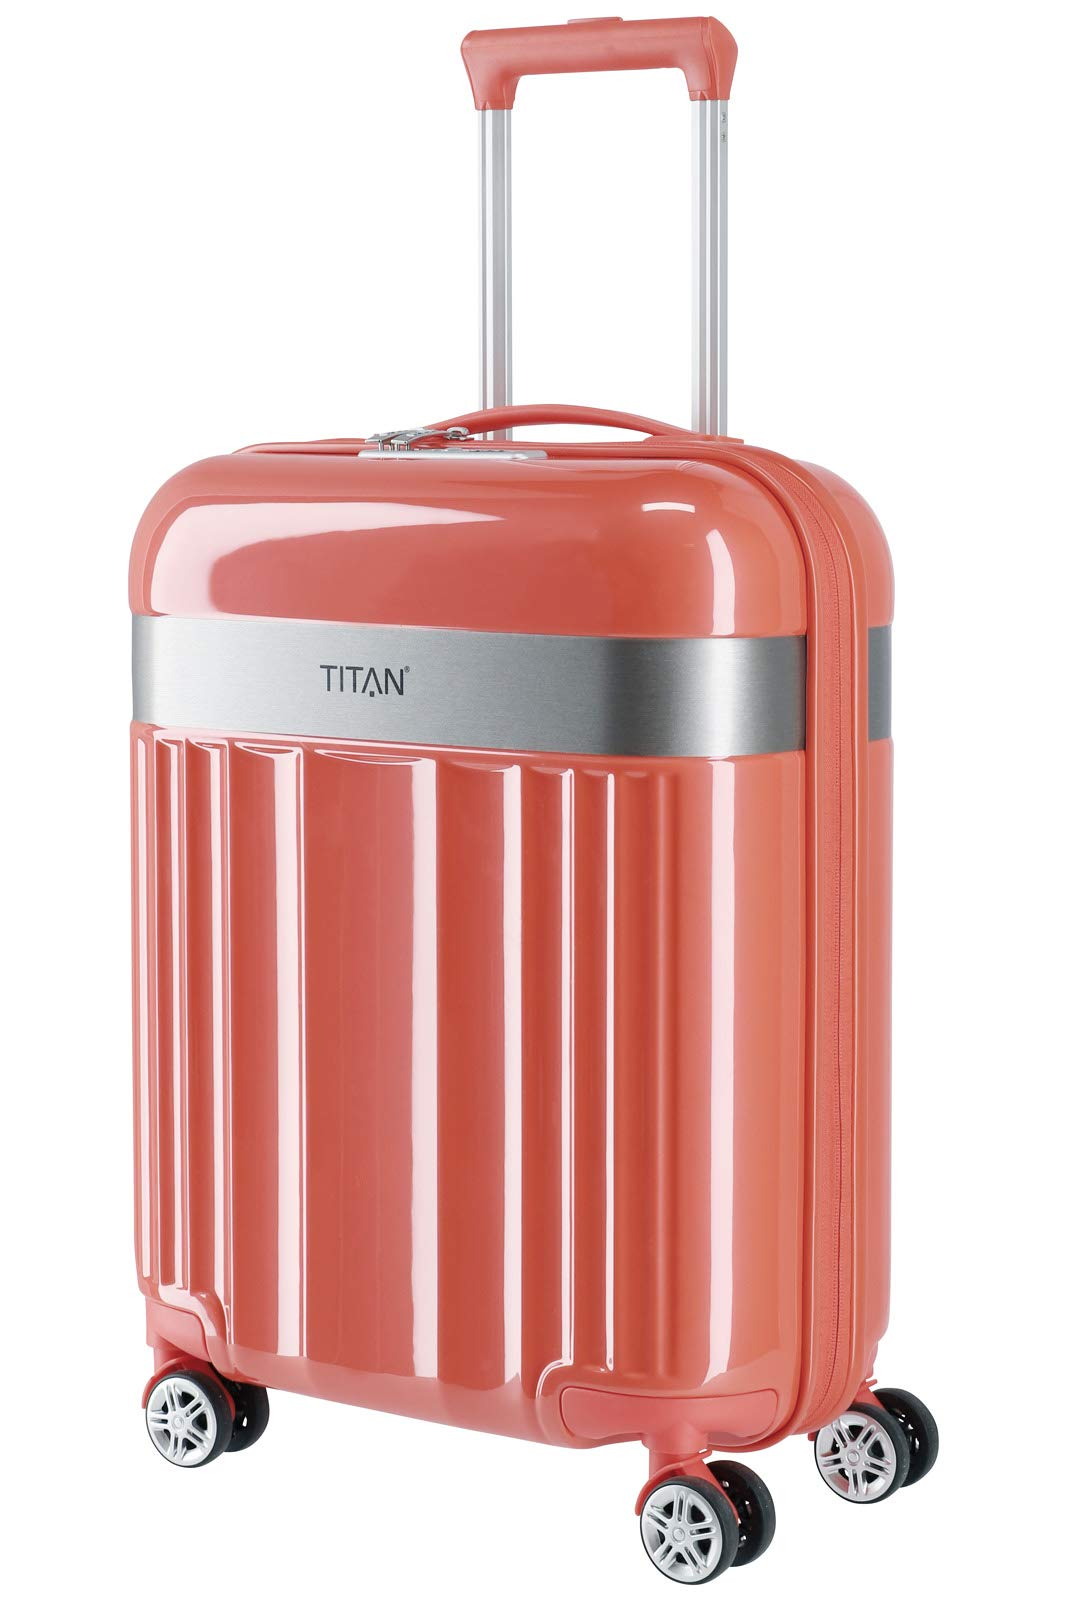 Titan-Gepckserie-Spotlight-Flash-Edle-Titan-trolleys-und-Beautycases-in-Knallbunten-Trendfarben-Koffer-S-55-cm-55-cm